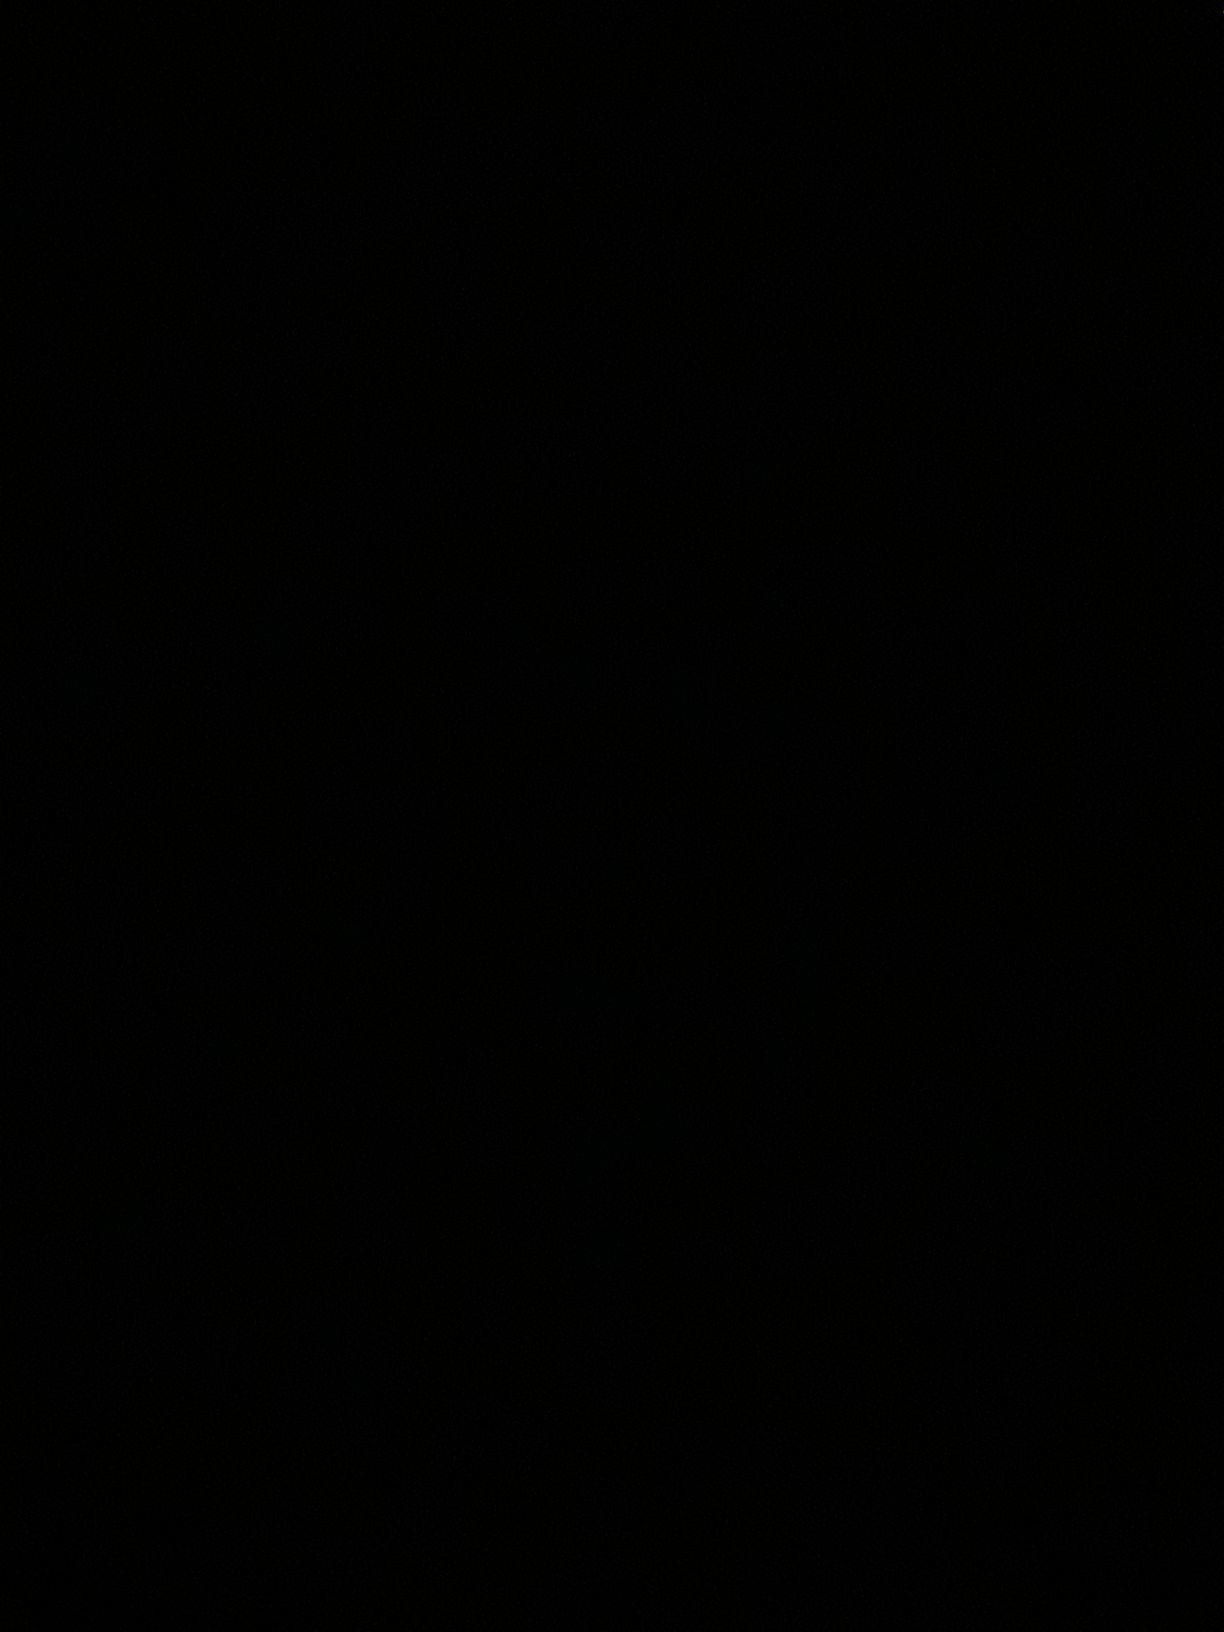 Yoshis Island - Game Boy cover